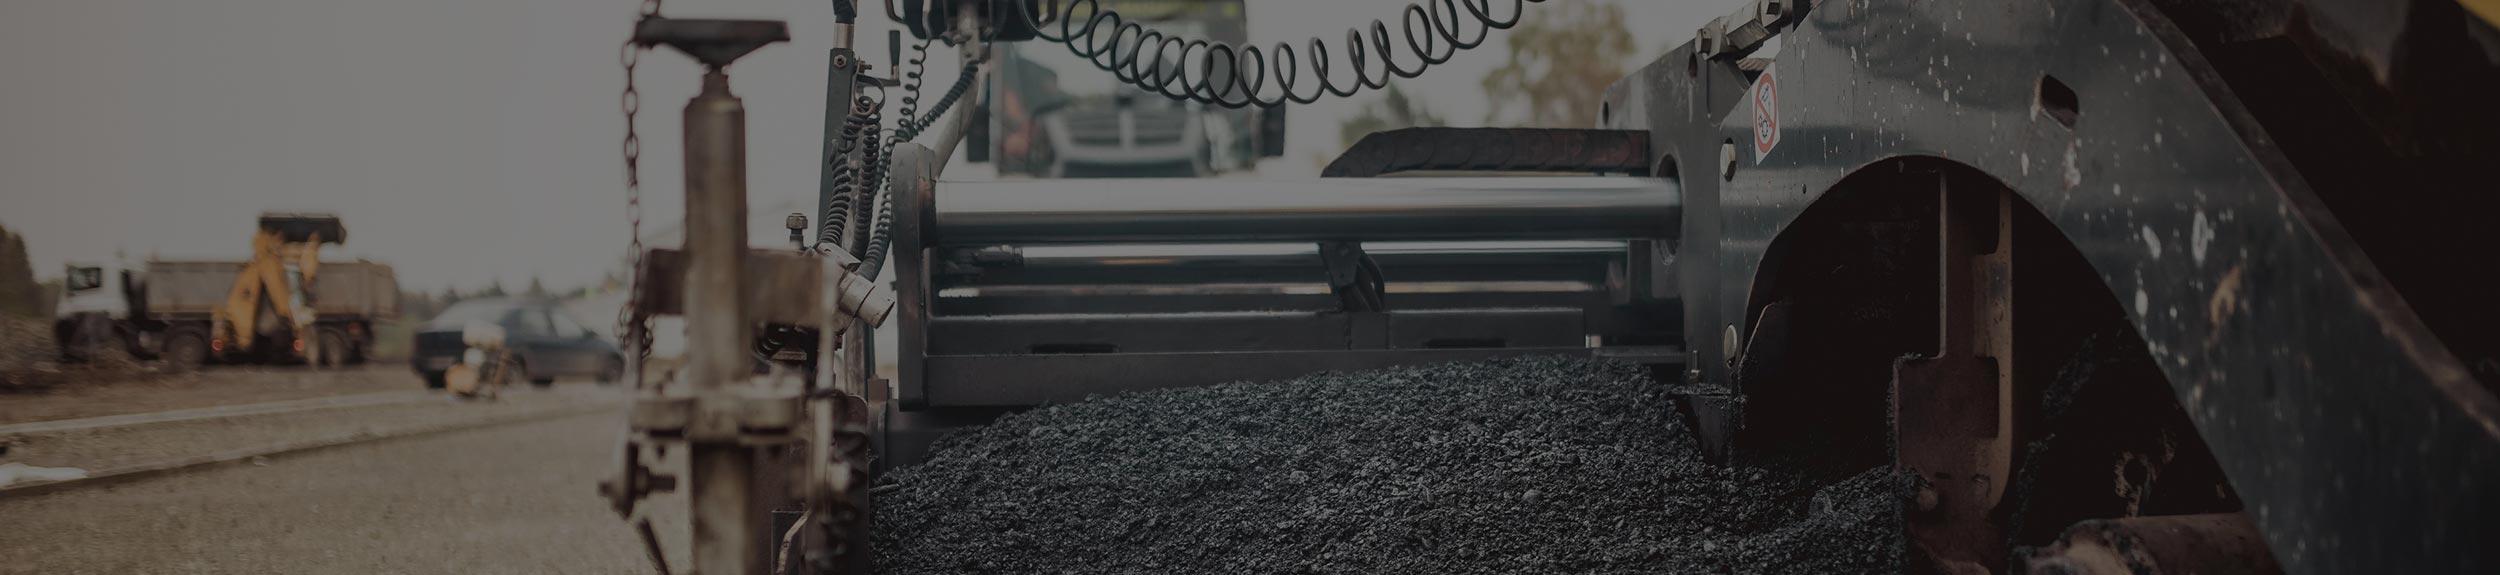 Paving Equipment - Collier Paving & Concrete